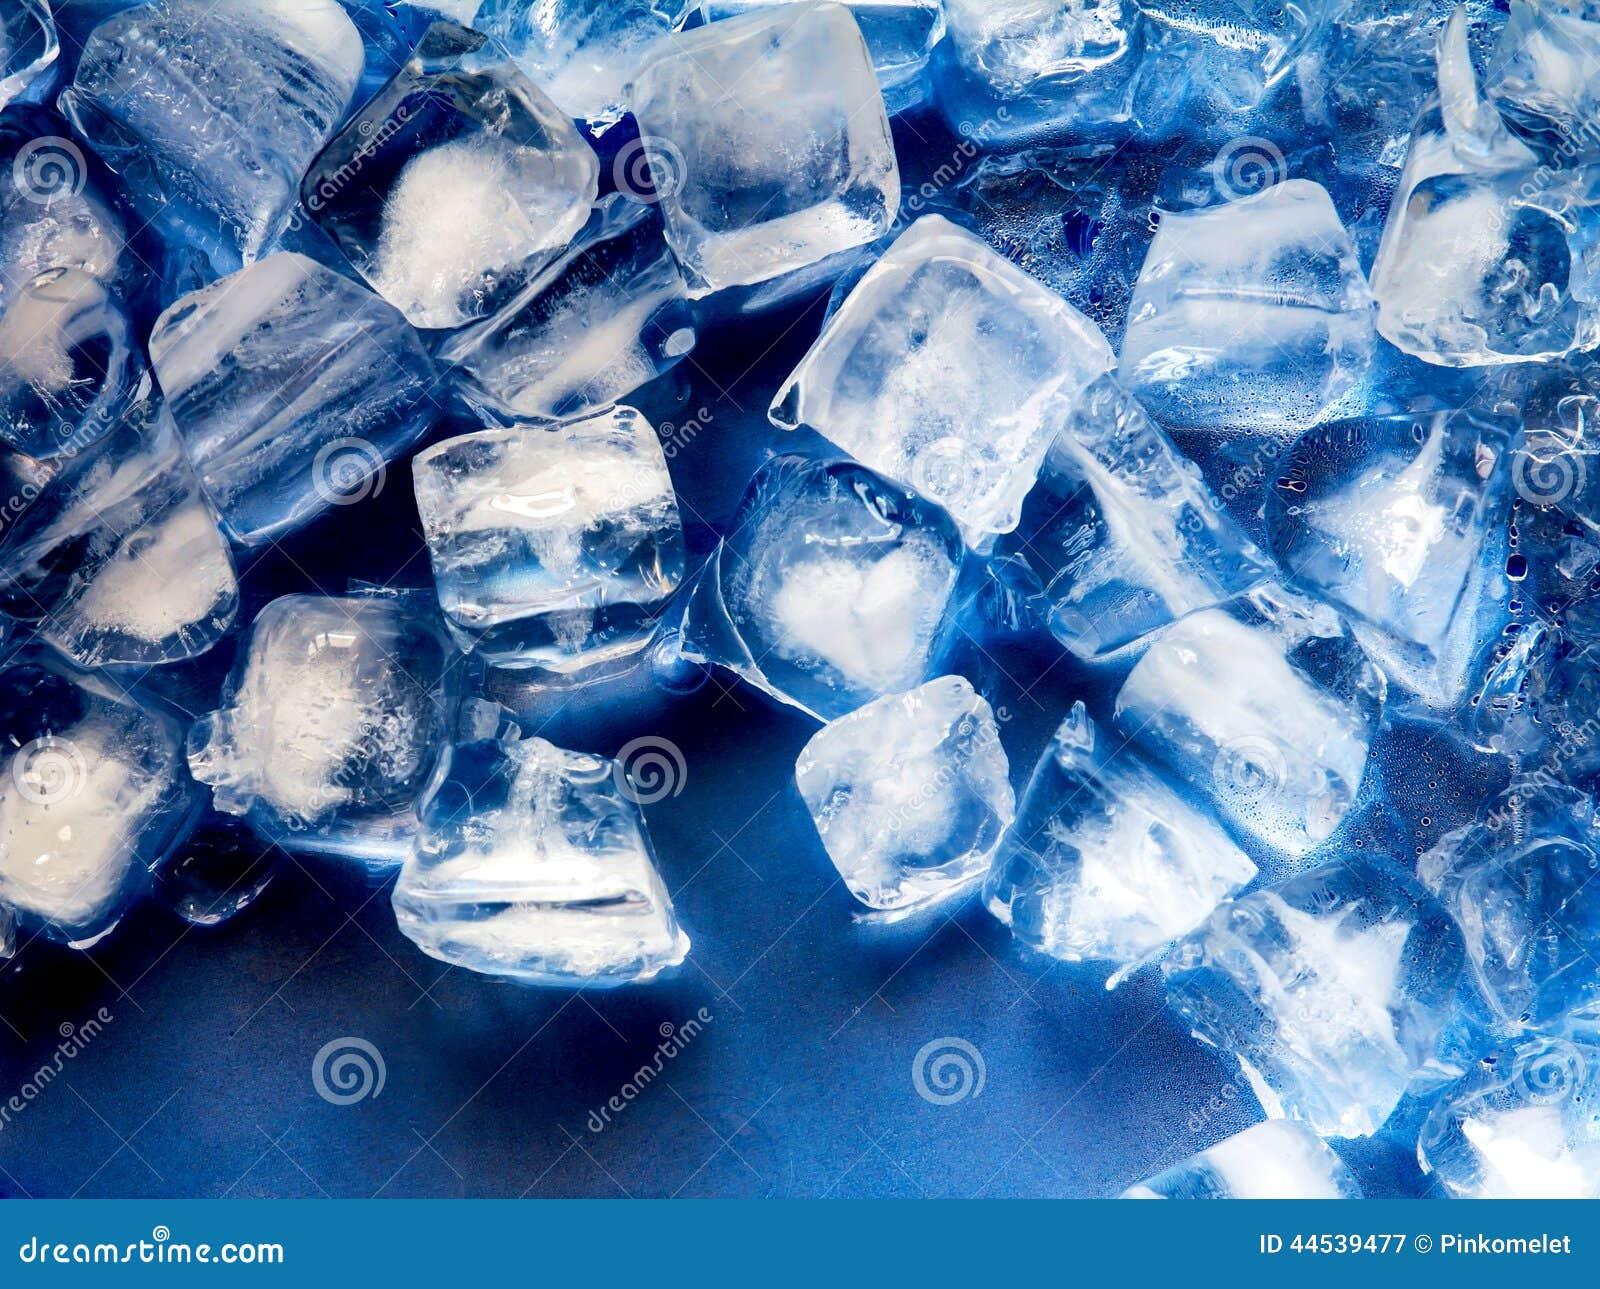 gla on sur le plateau bleu en plastique photo stock image 44539477. Black Bedroom Furniture Sets. Home Design Ideas